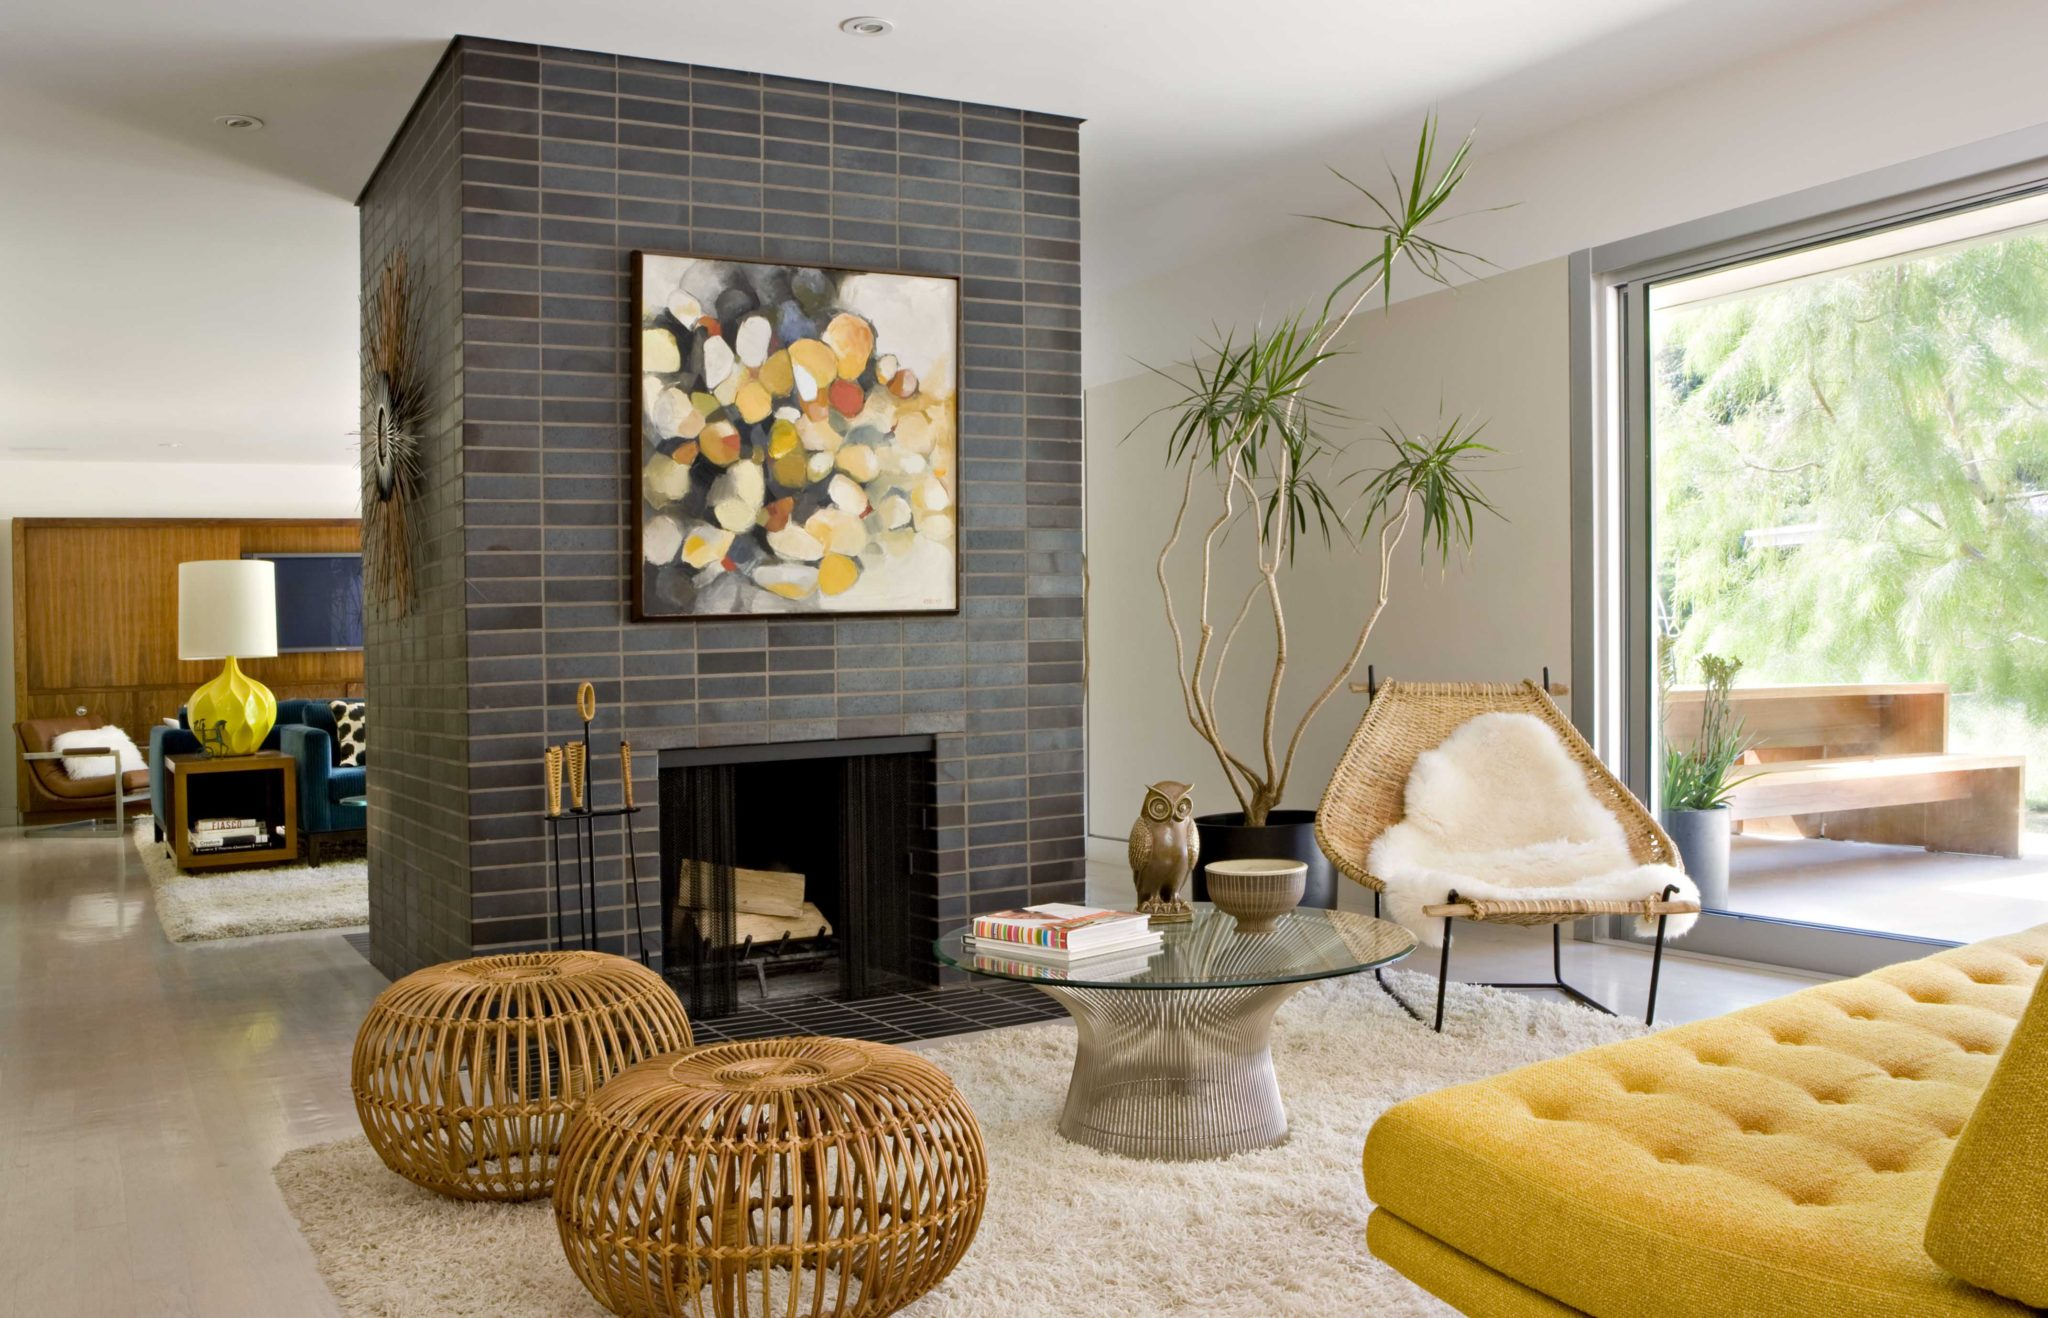 Interior design by Jamie Bush & Co.